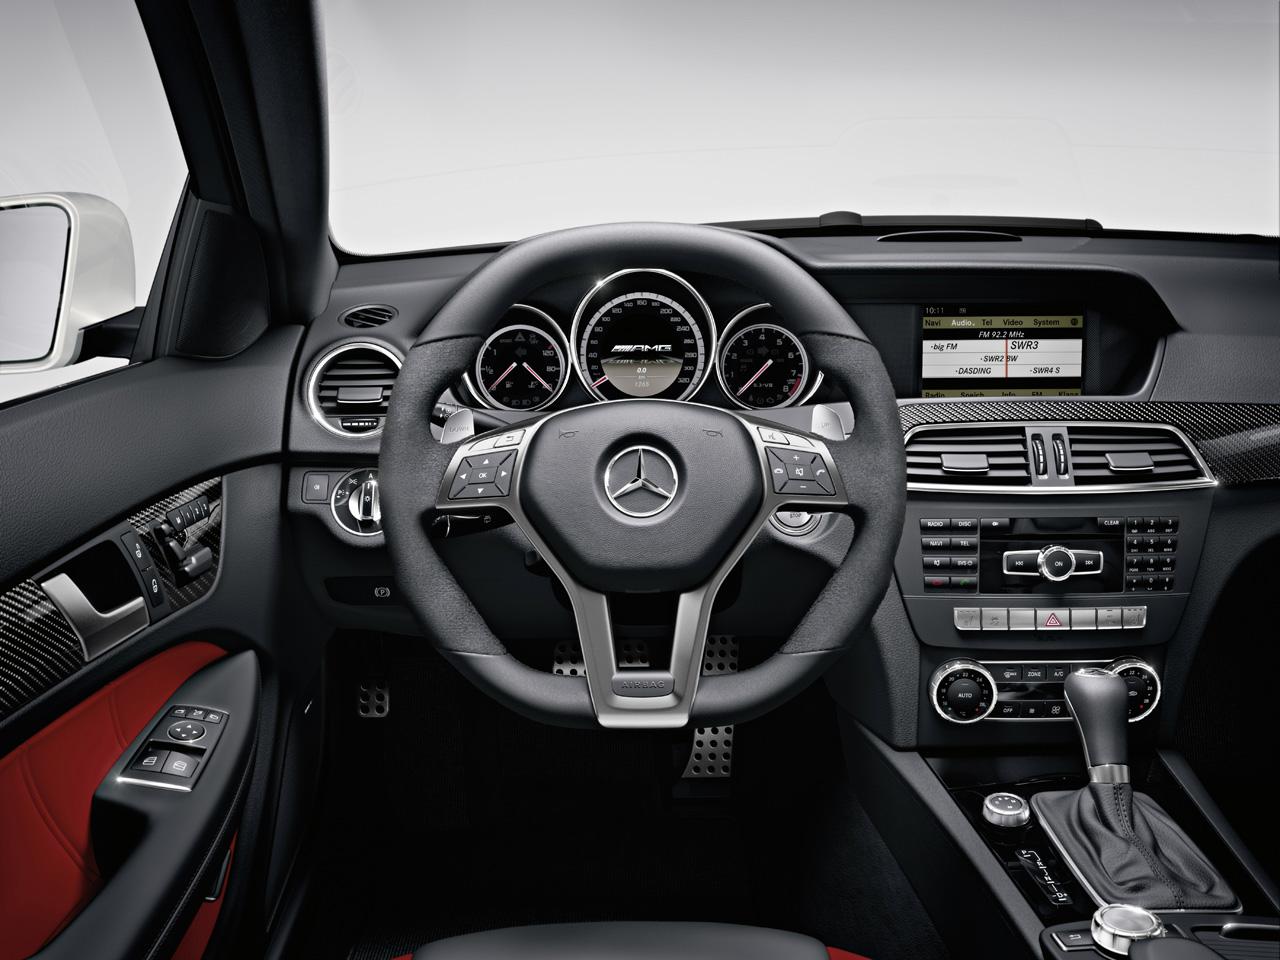 http://2.bp.blogspot.com/-M5CgaOZKNr8/TrEaqCbEIWI/AAAAAAAAFbQ/KvXSMIt0XGY/s1600/Mercedes+C63+AMG+Coupe+3.jpg